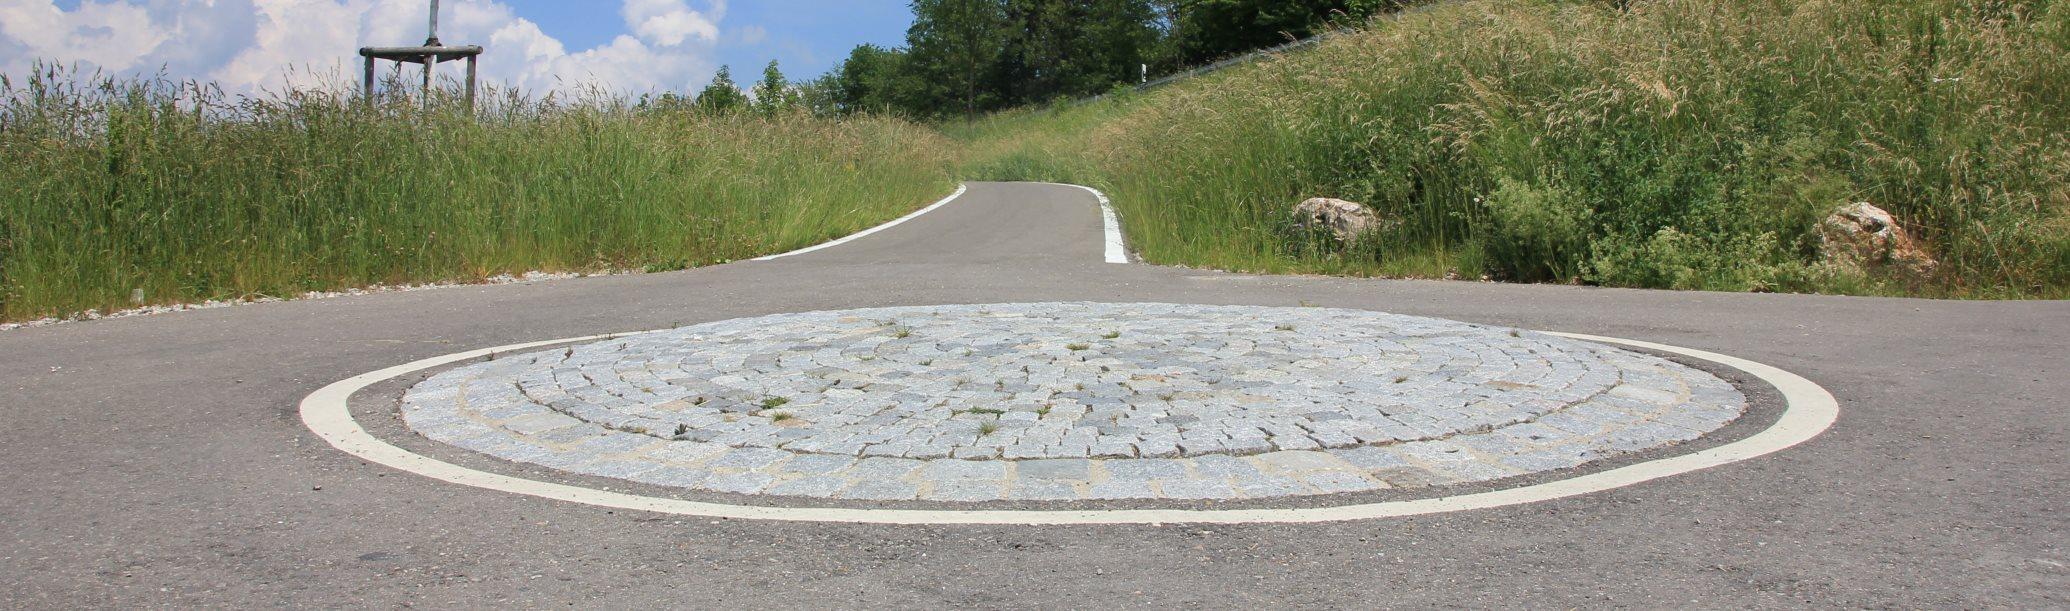 Fahrrad Kreisverkehr